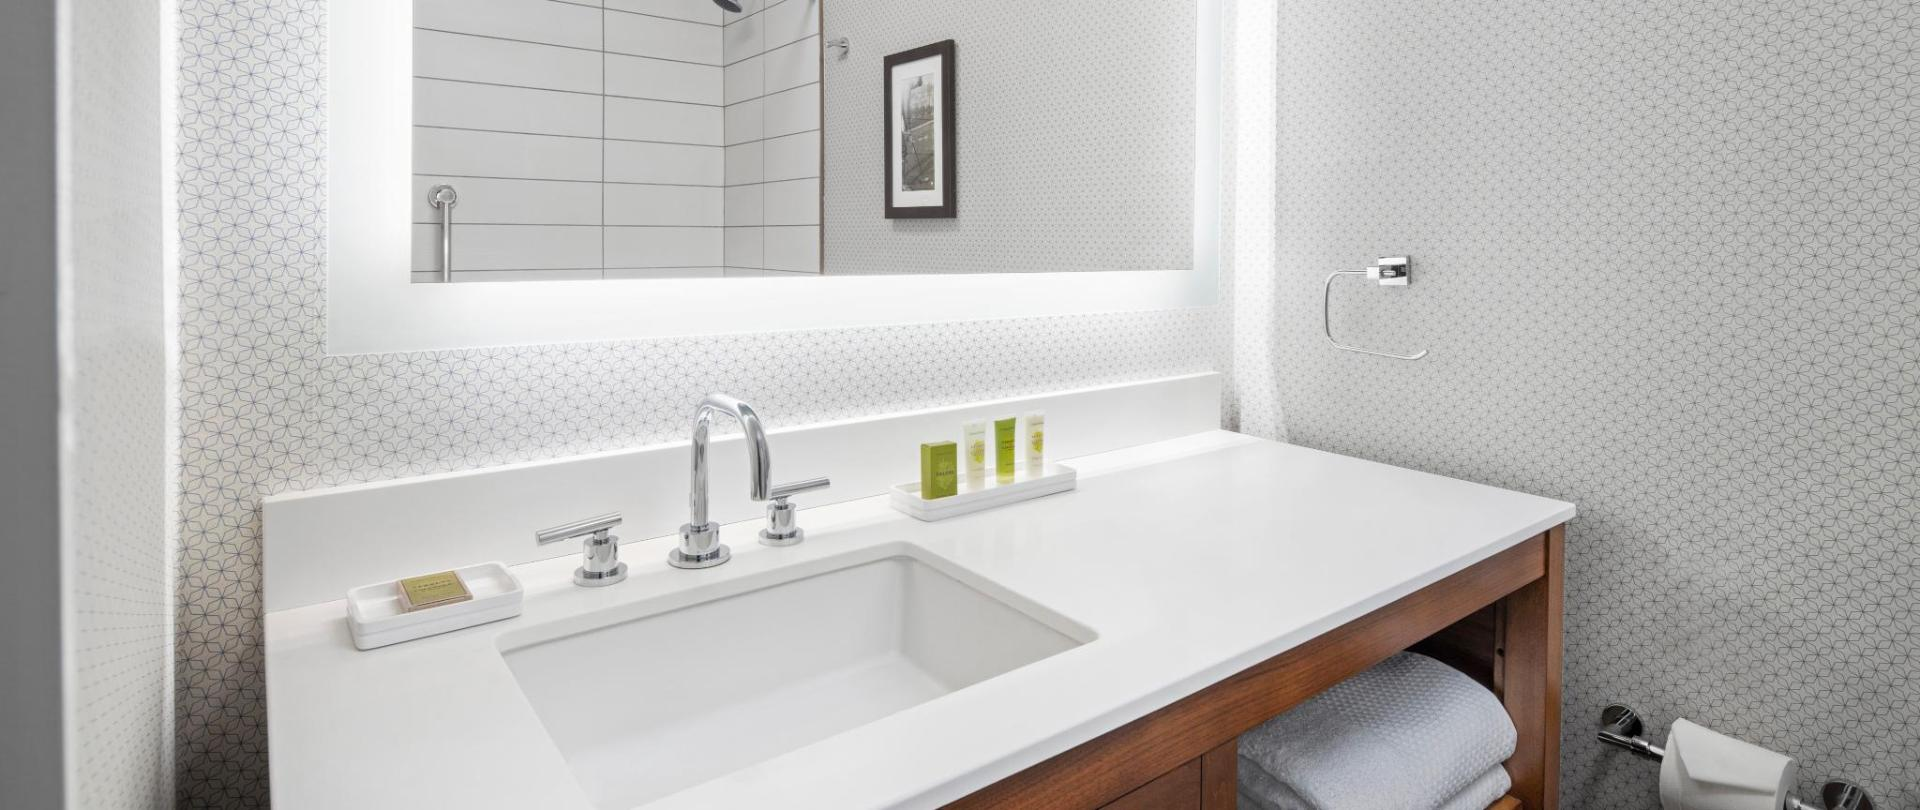 CHIBHHH_Standard_Bathroom.jpg